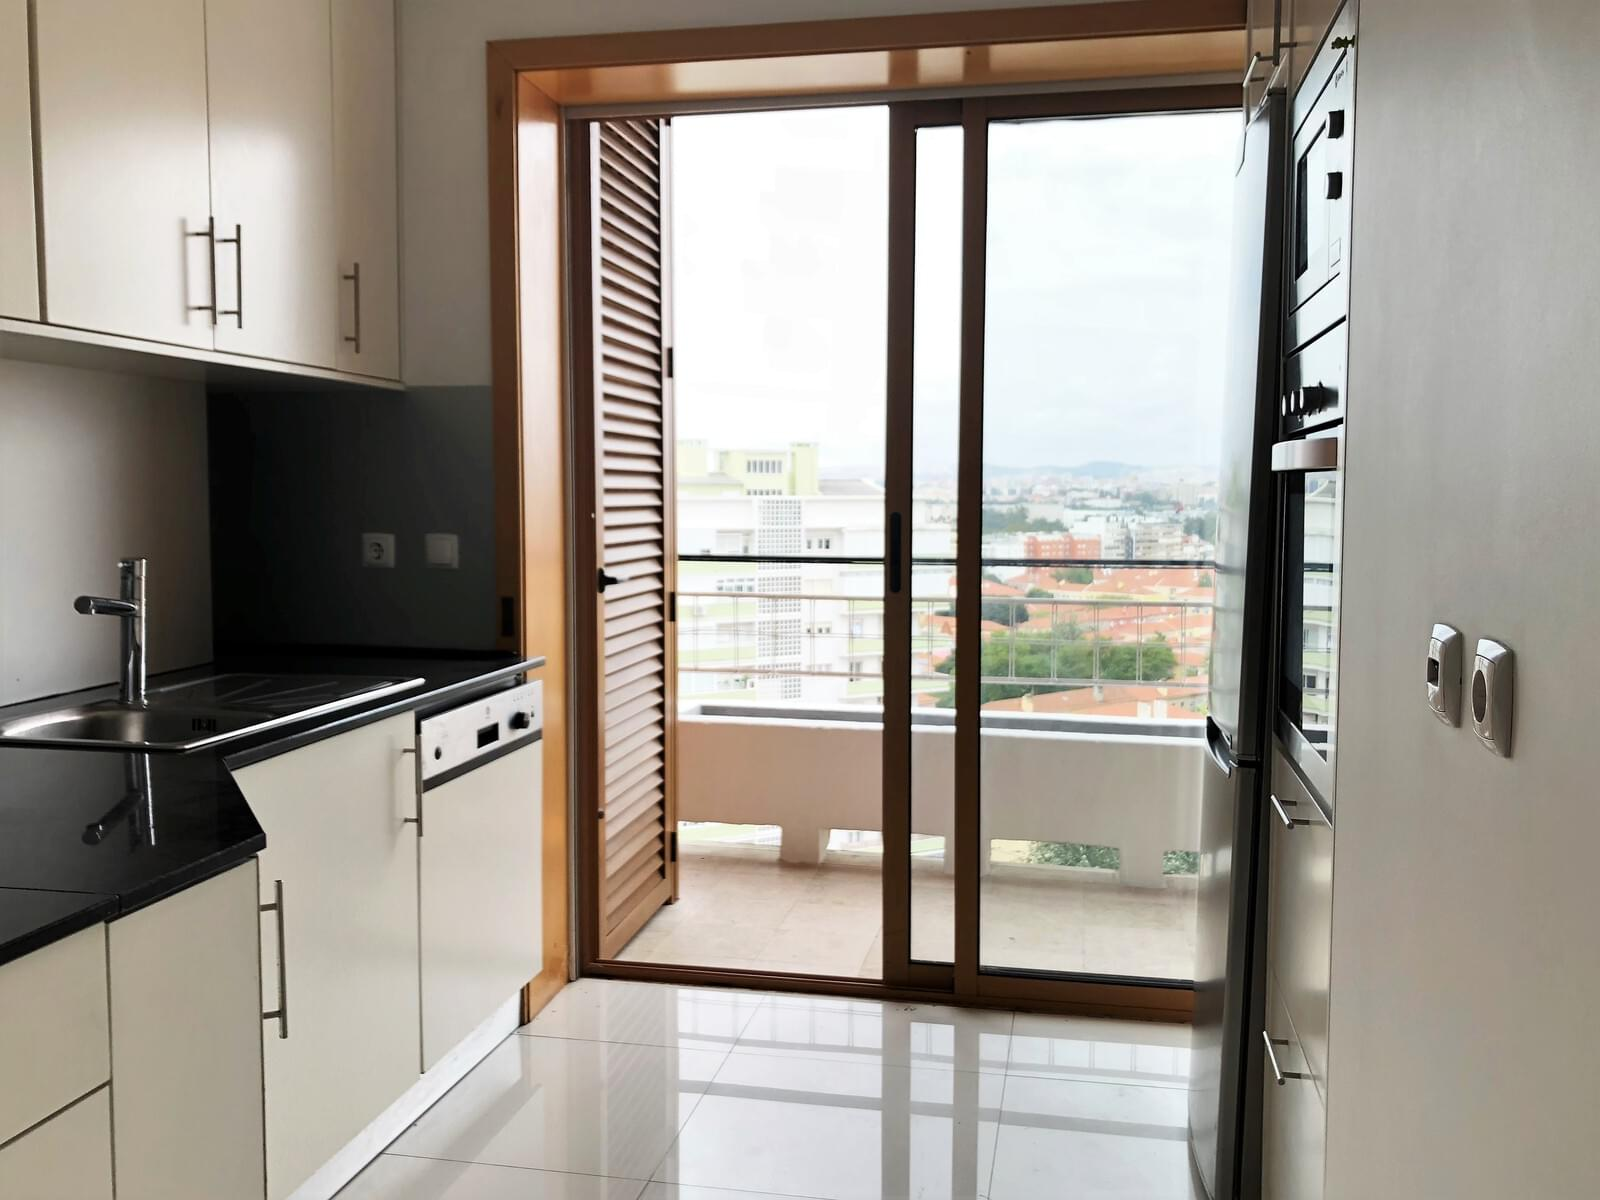 pf18040-apartamento-t3-lisboa-734499e6-ac30-4788-b4d3-2563b7cc9867